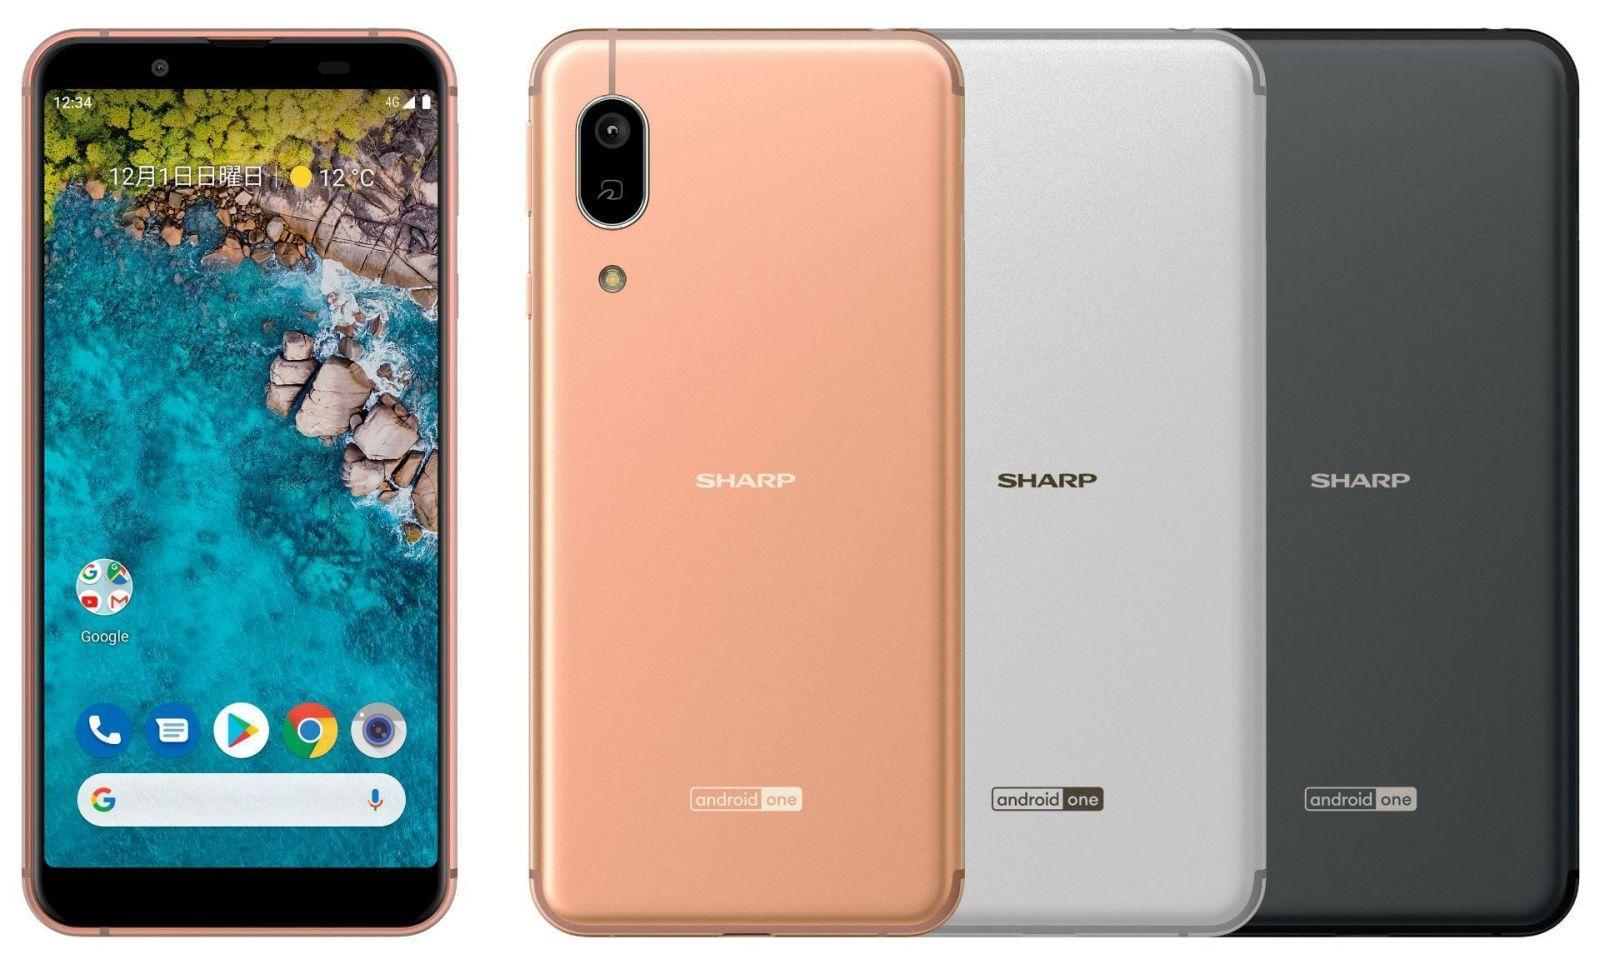 Sharp выпускает смартфон Sharp S7 (android one s7)